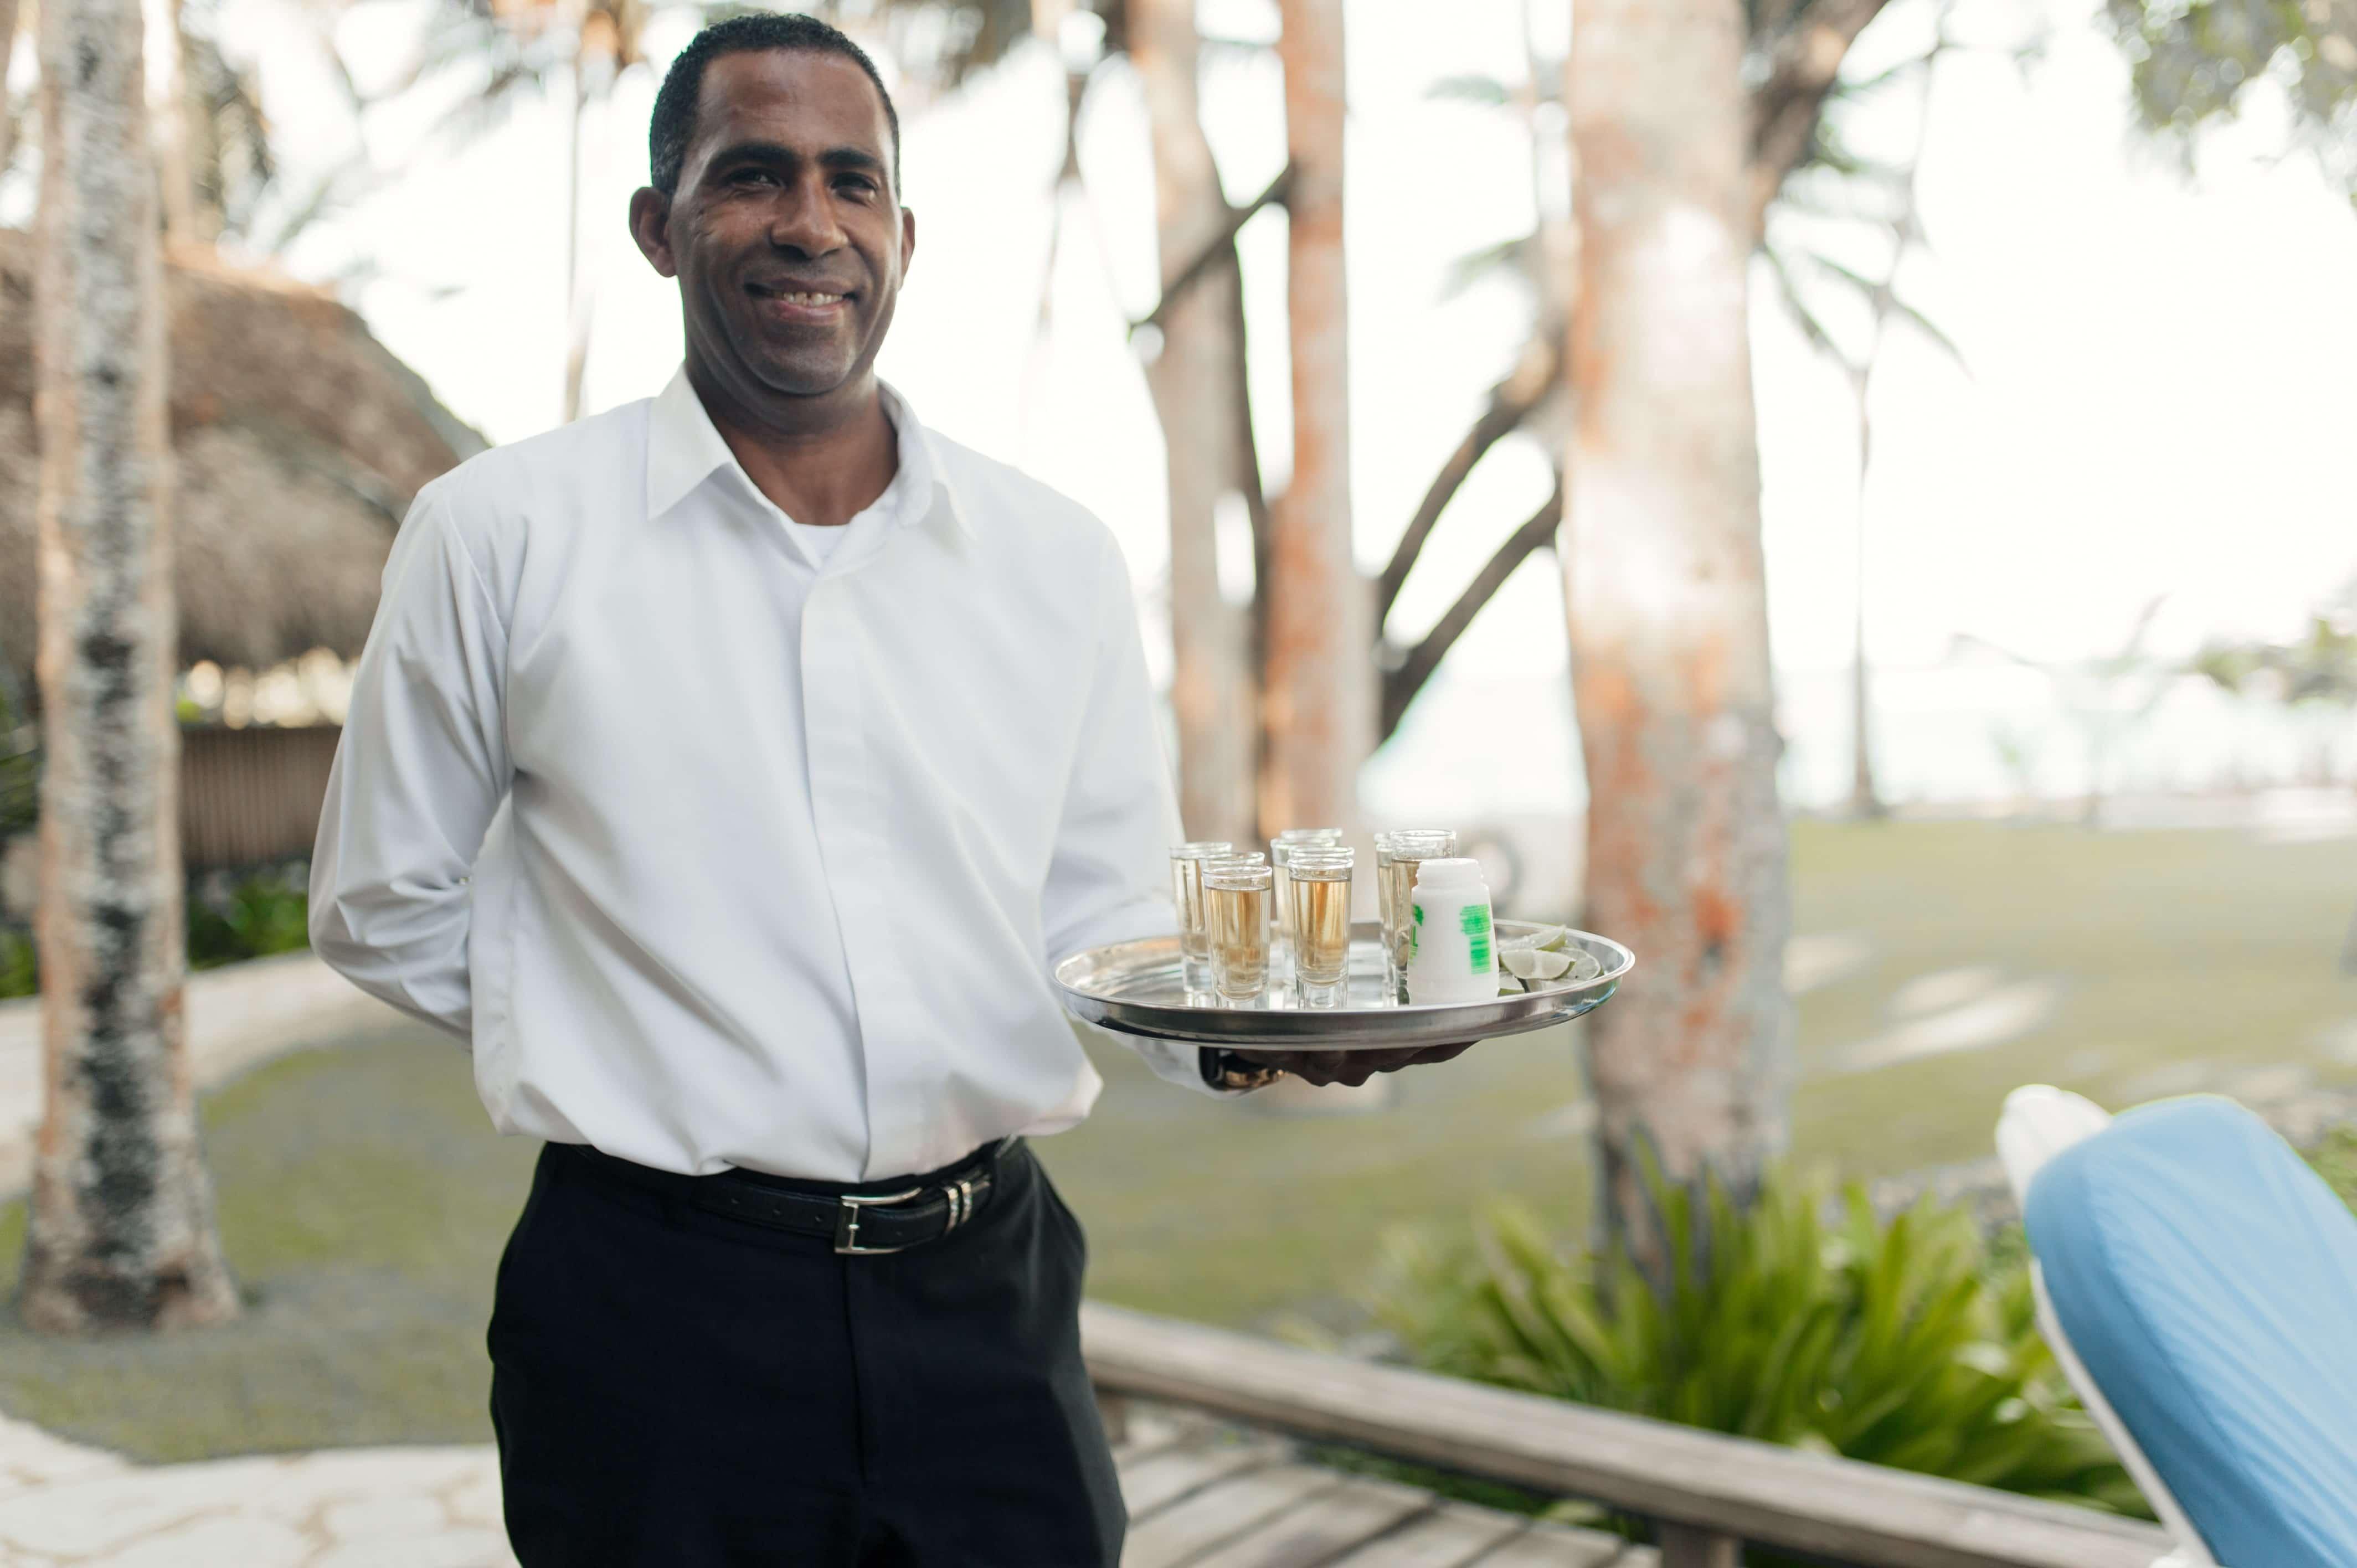 Wedding Waiter